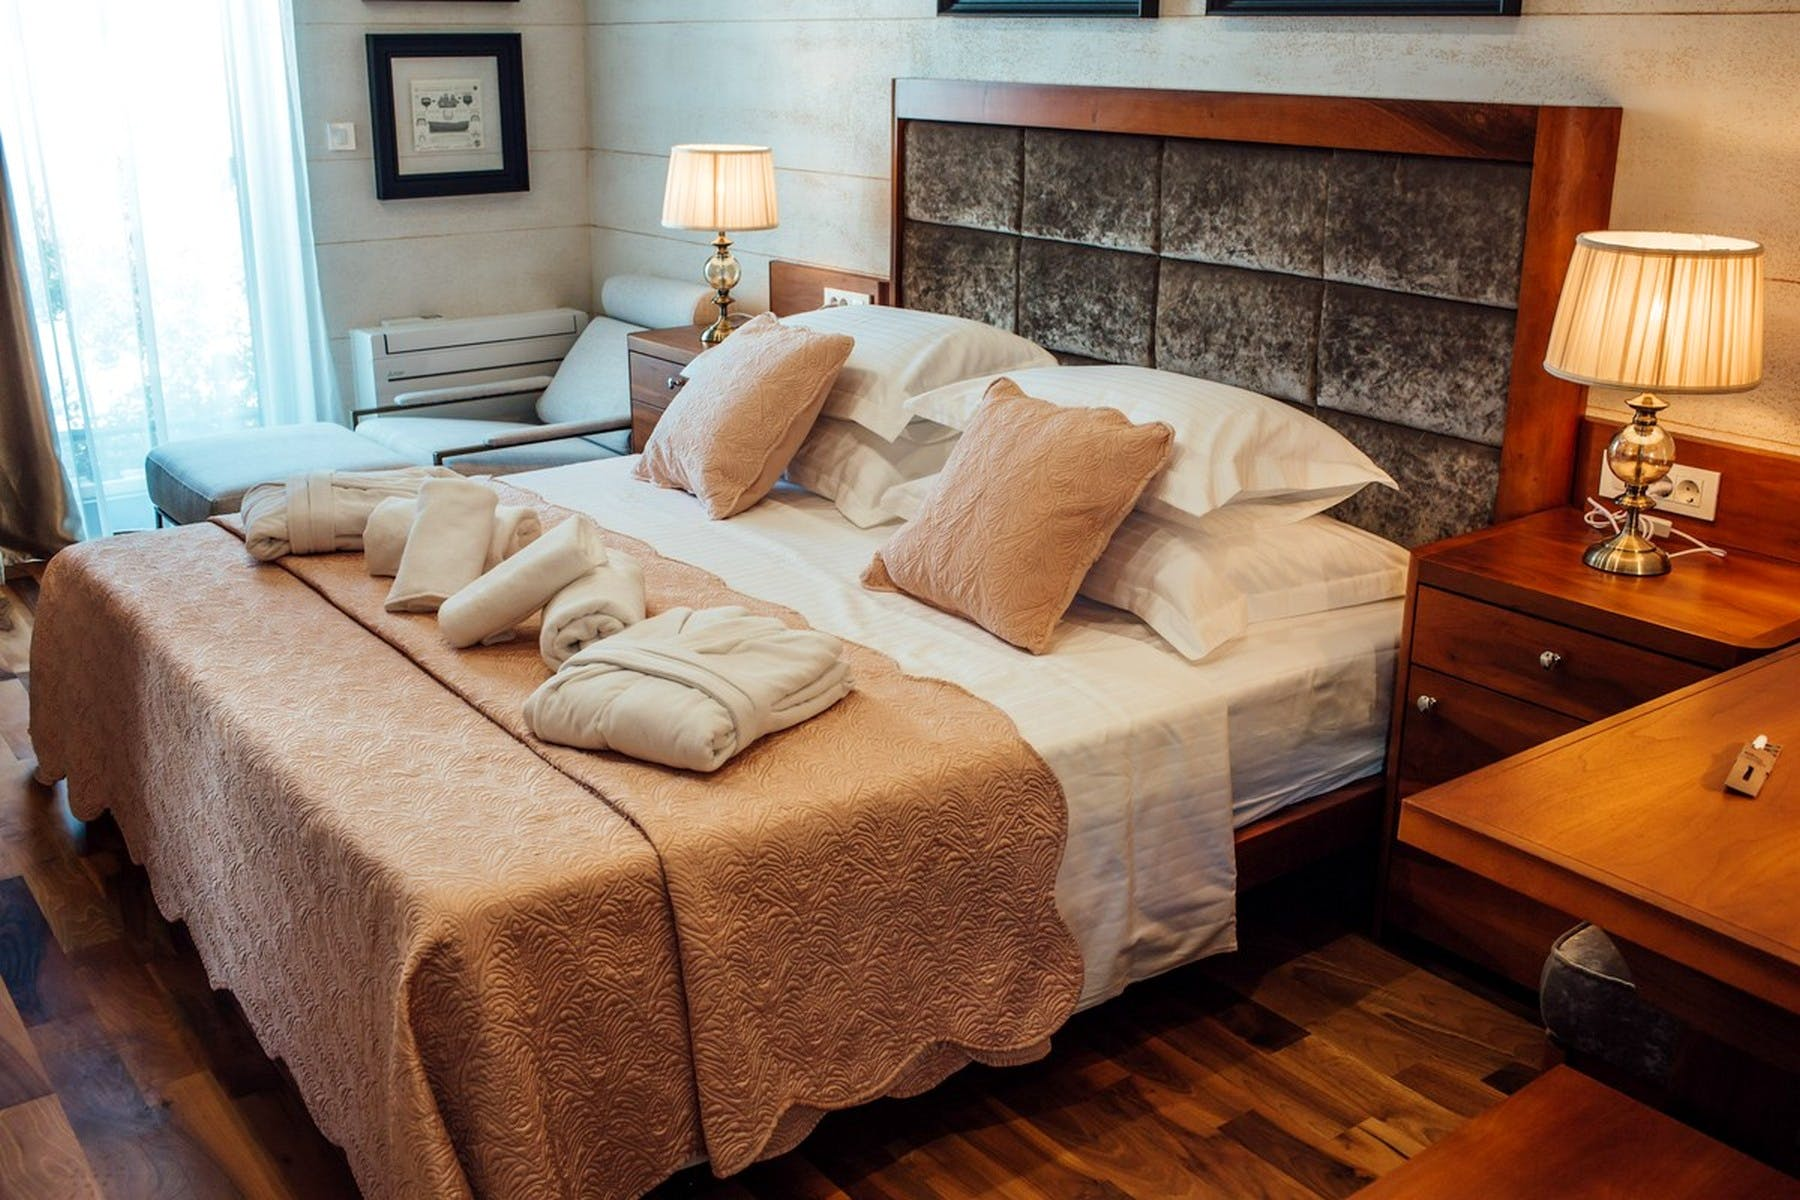 Big, comfortable bed